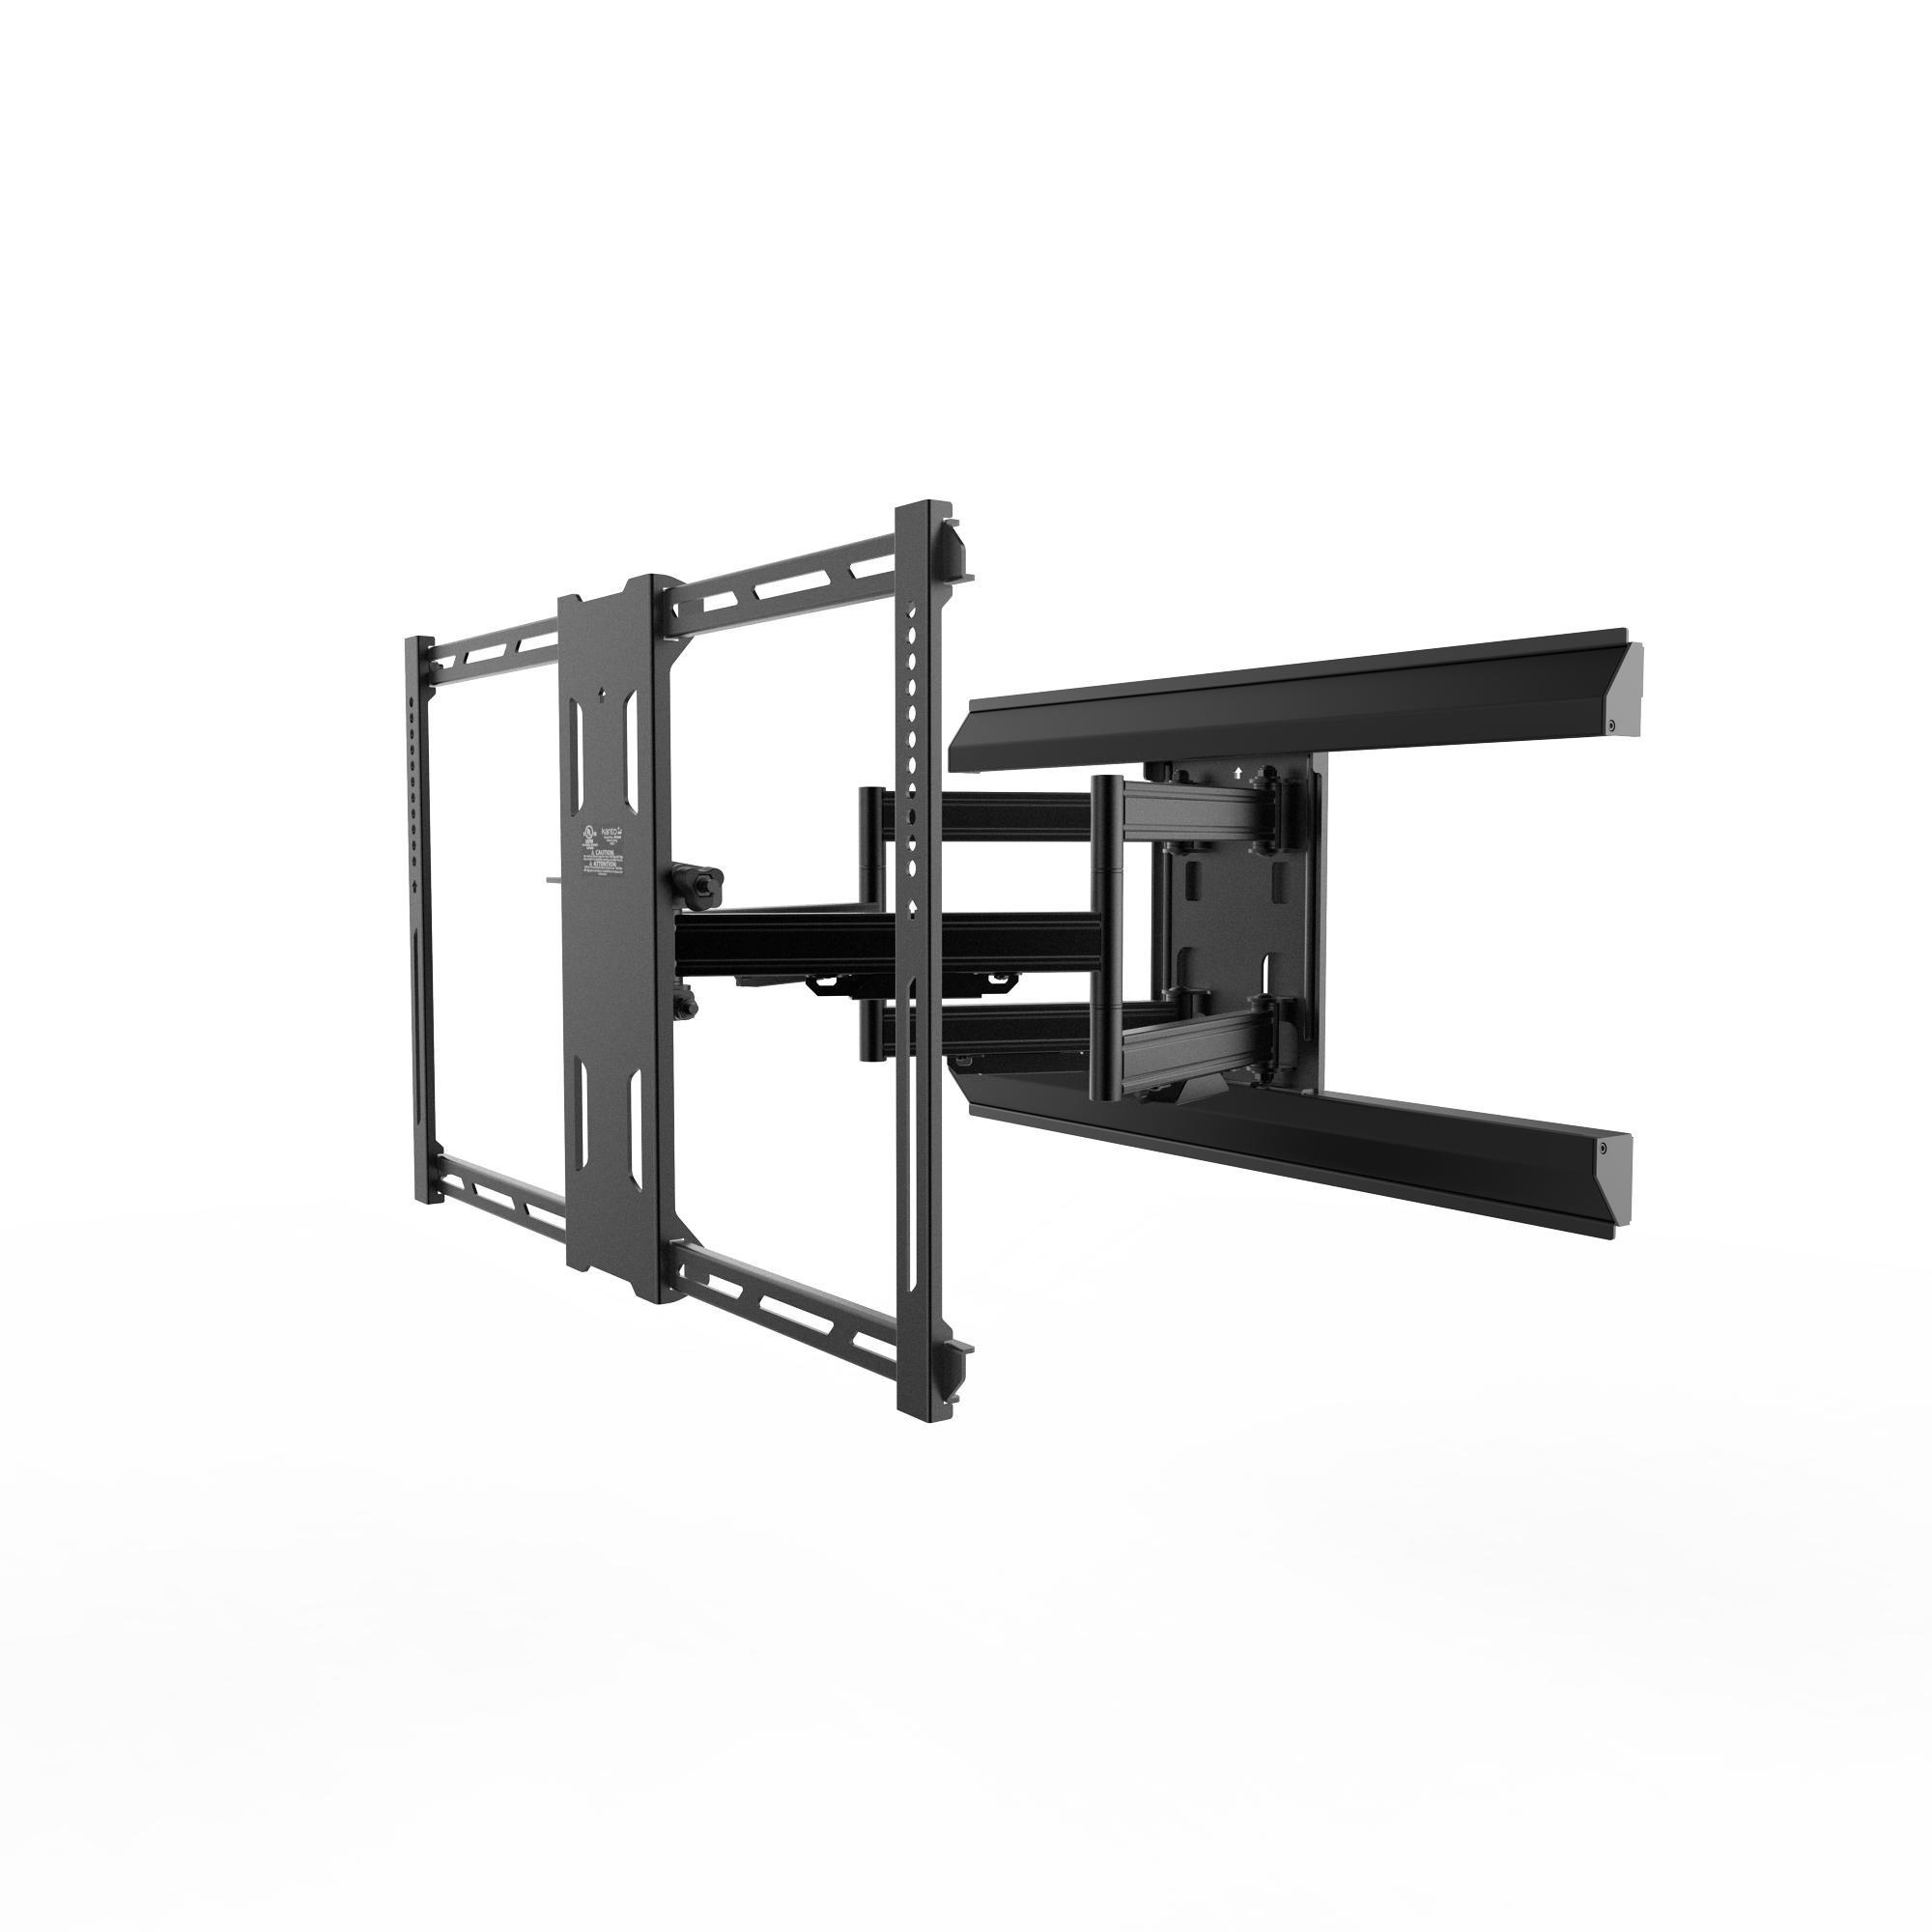 Kanto Full Motion PMX660 Pro 系列支架适用于 93.98 厘米至 203.2 厘米平板电视,黑色PMX680 PMX680